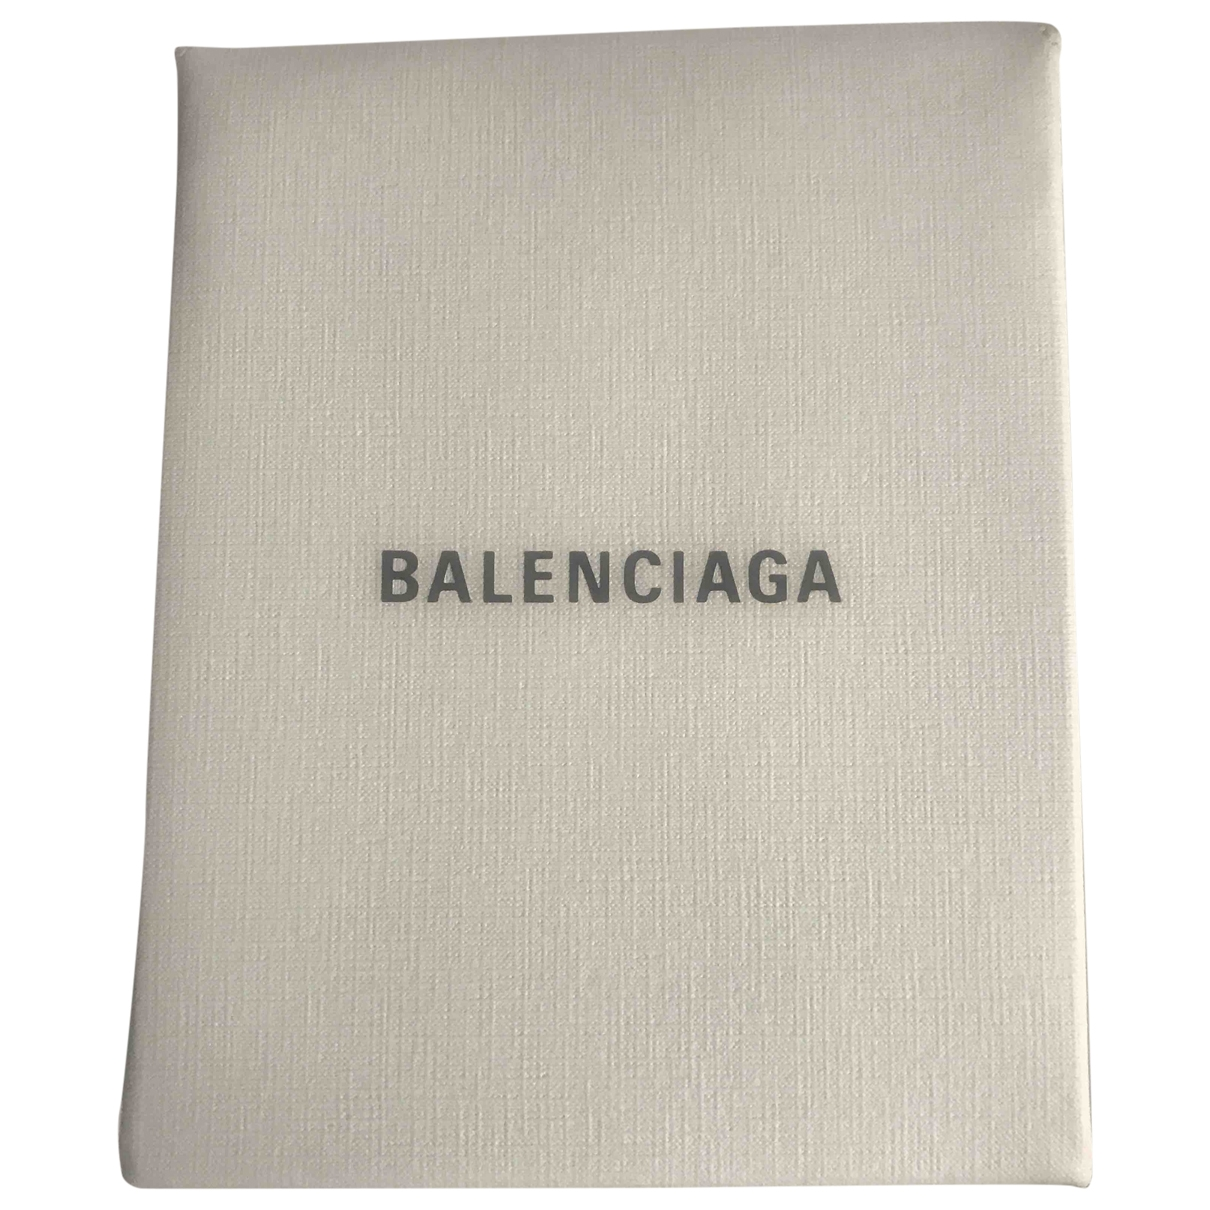 Balenciaga \N White Leather Clutch bag for Women \N